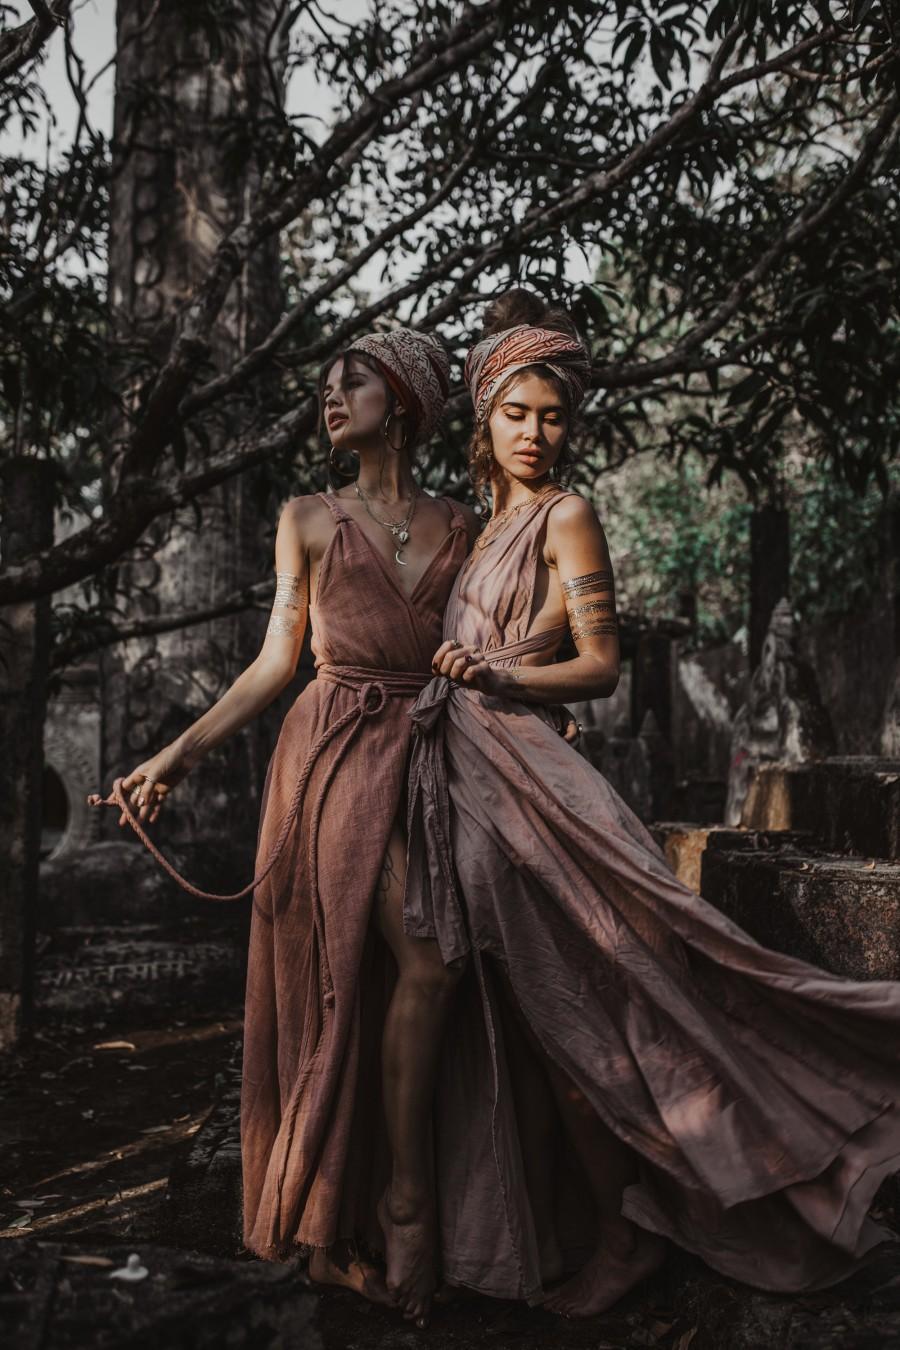 Wedding - Dusty Pink Boho Bridesmaid Dress • Bohemian Goddess Dress Long • Organic Multiway Dress • Prom Maxi Dress for Women • Infinity Maxi Dress